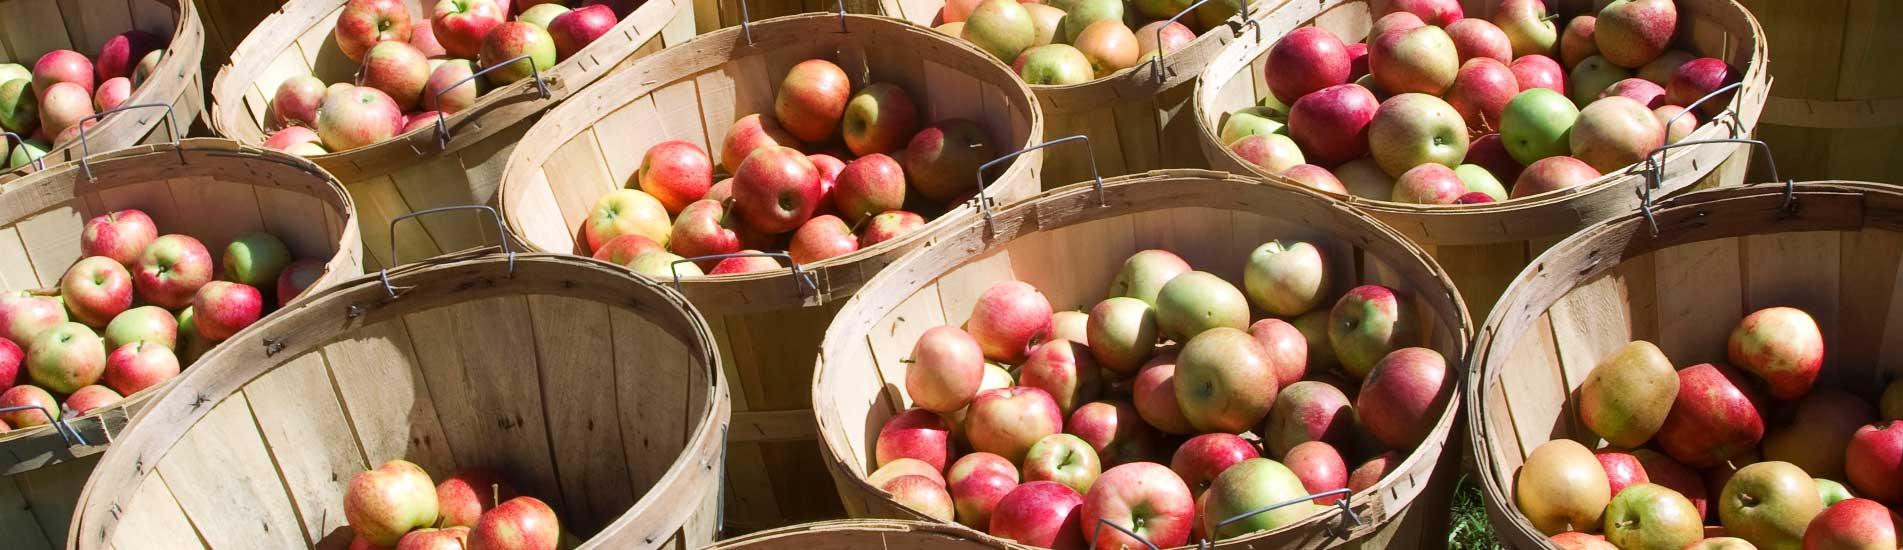 apples in buckets